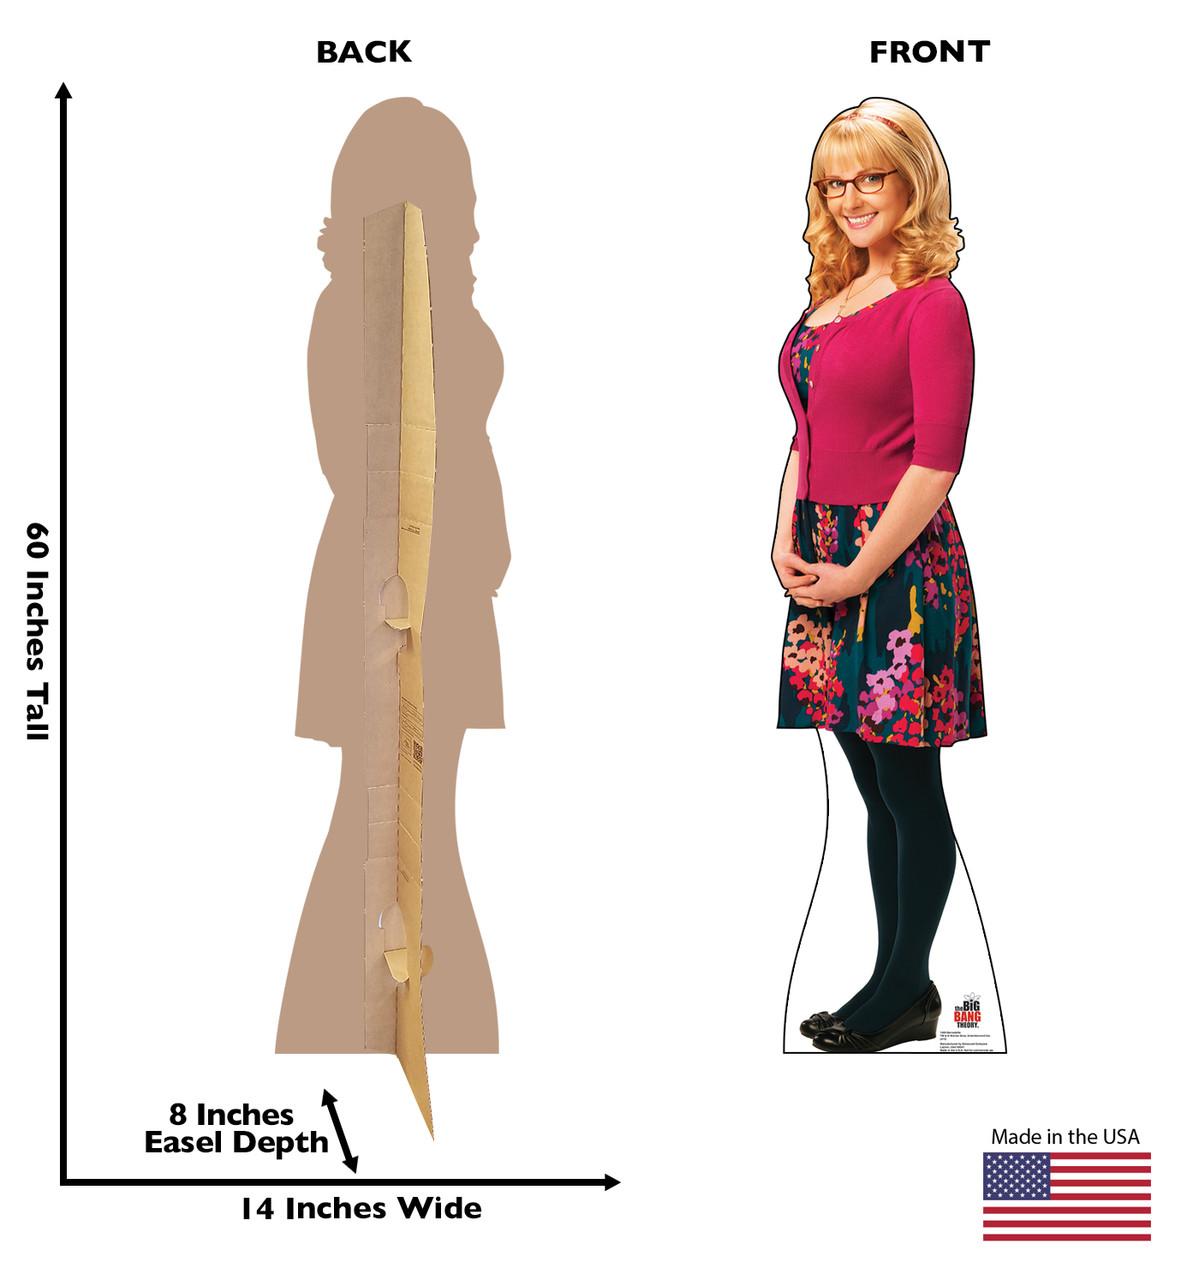 Life-size Bernadette - Big Bang Theory Cardboard Standup   Cardboard Cutout